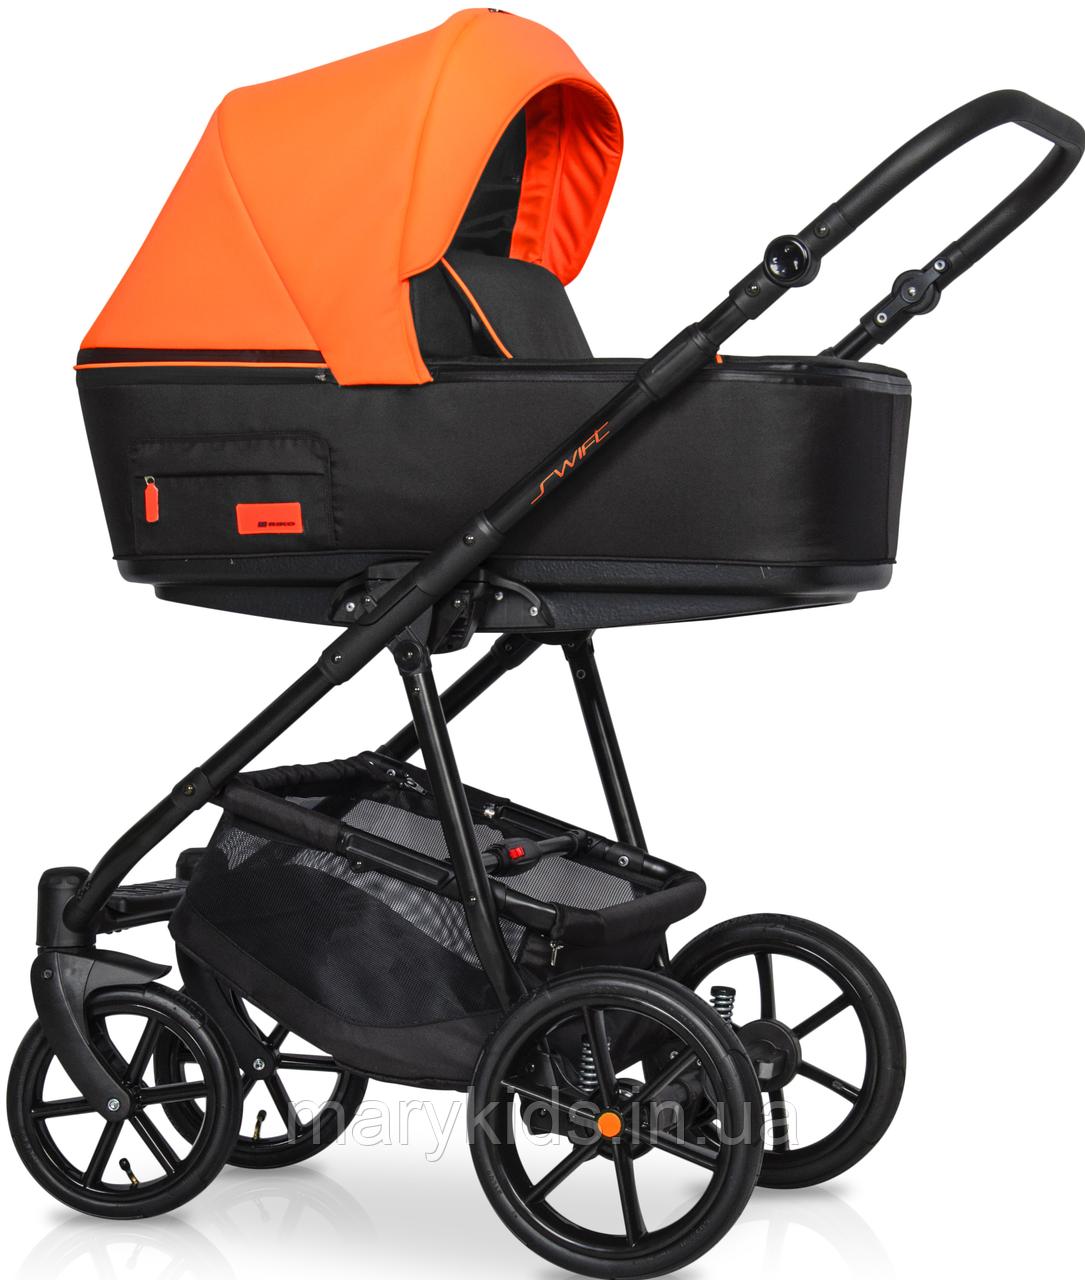 Дитяча універсальна коляска 3 в 1 Riko Swift Neon 24 Party Orange